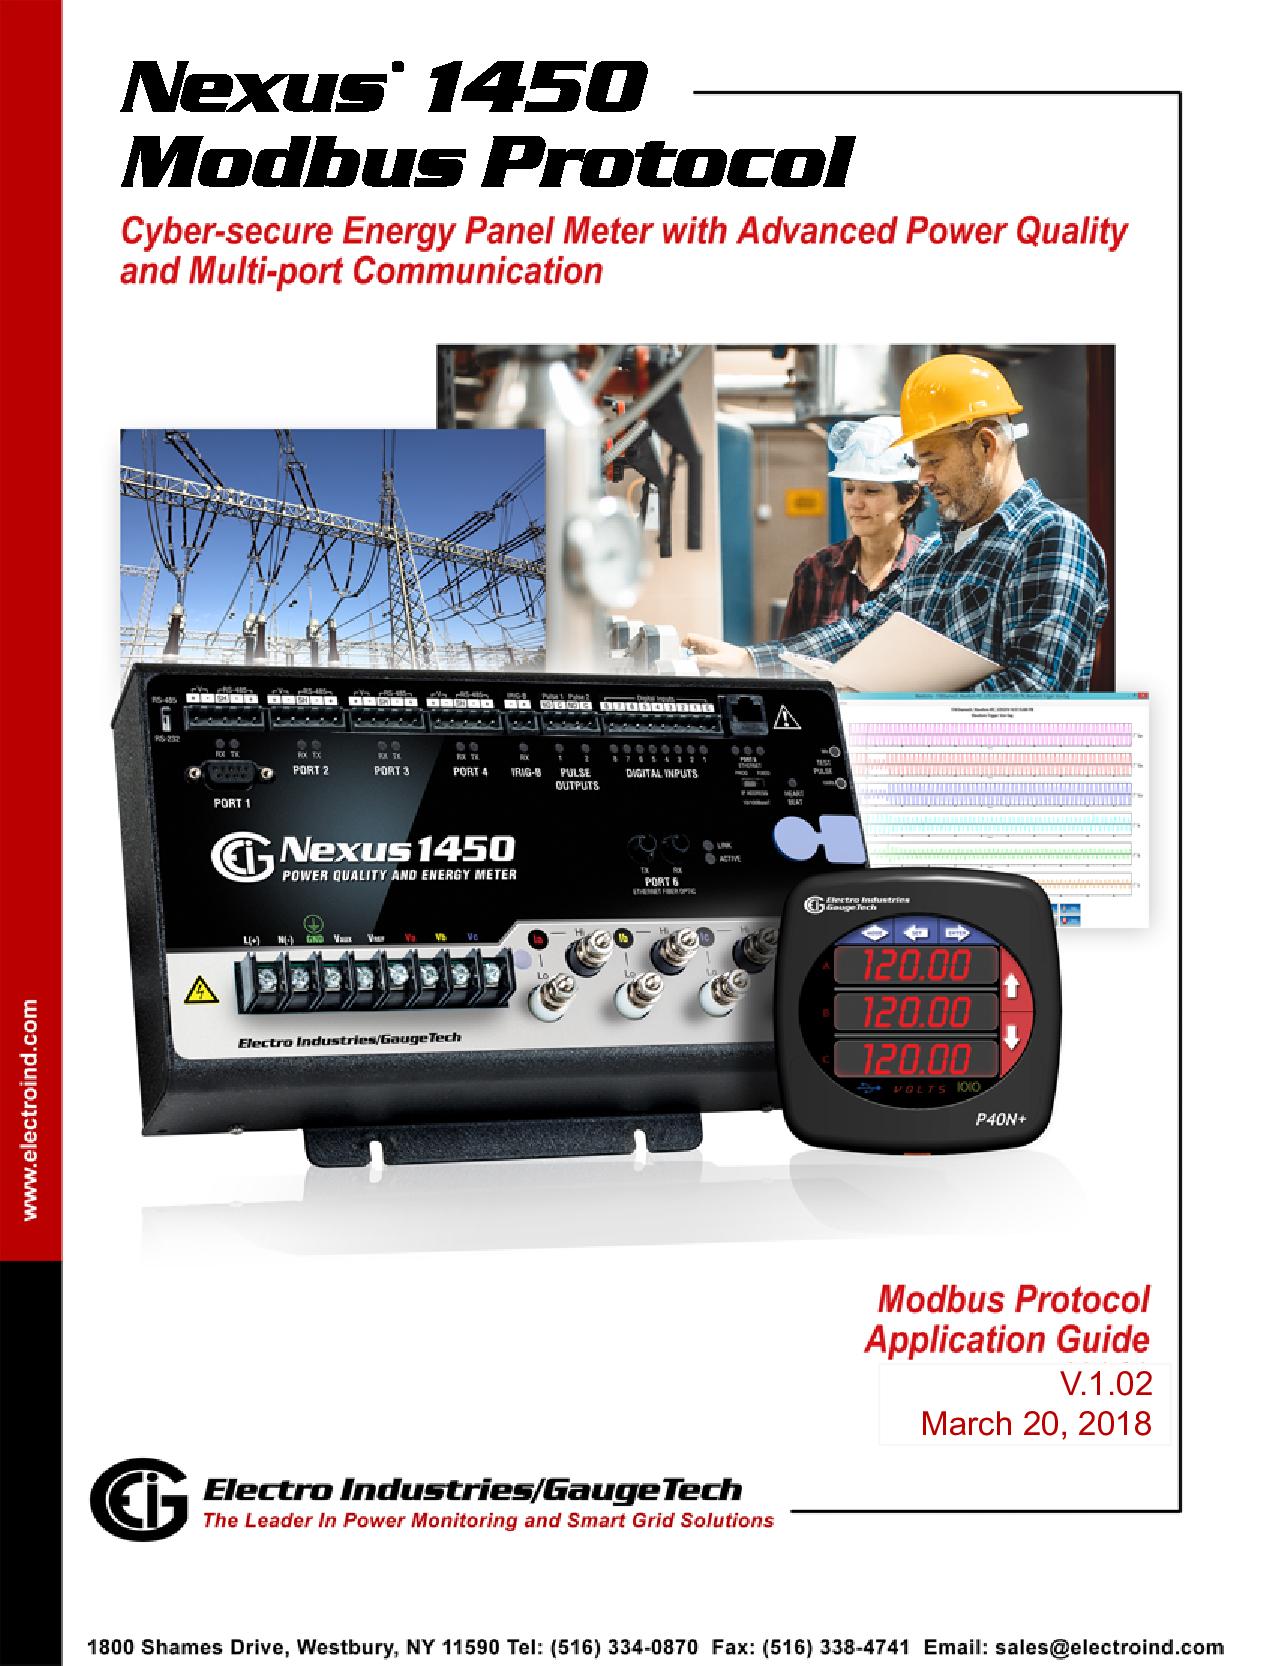 Nexus 1450 Power Meter Modbus Manual V 1 02 E171707